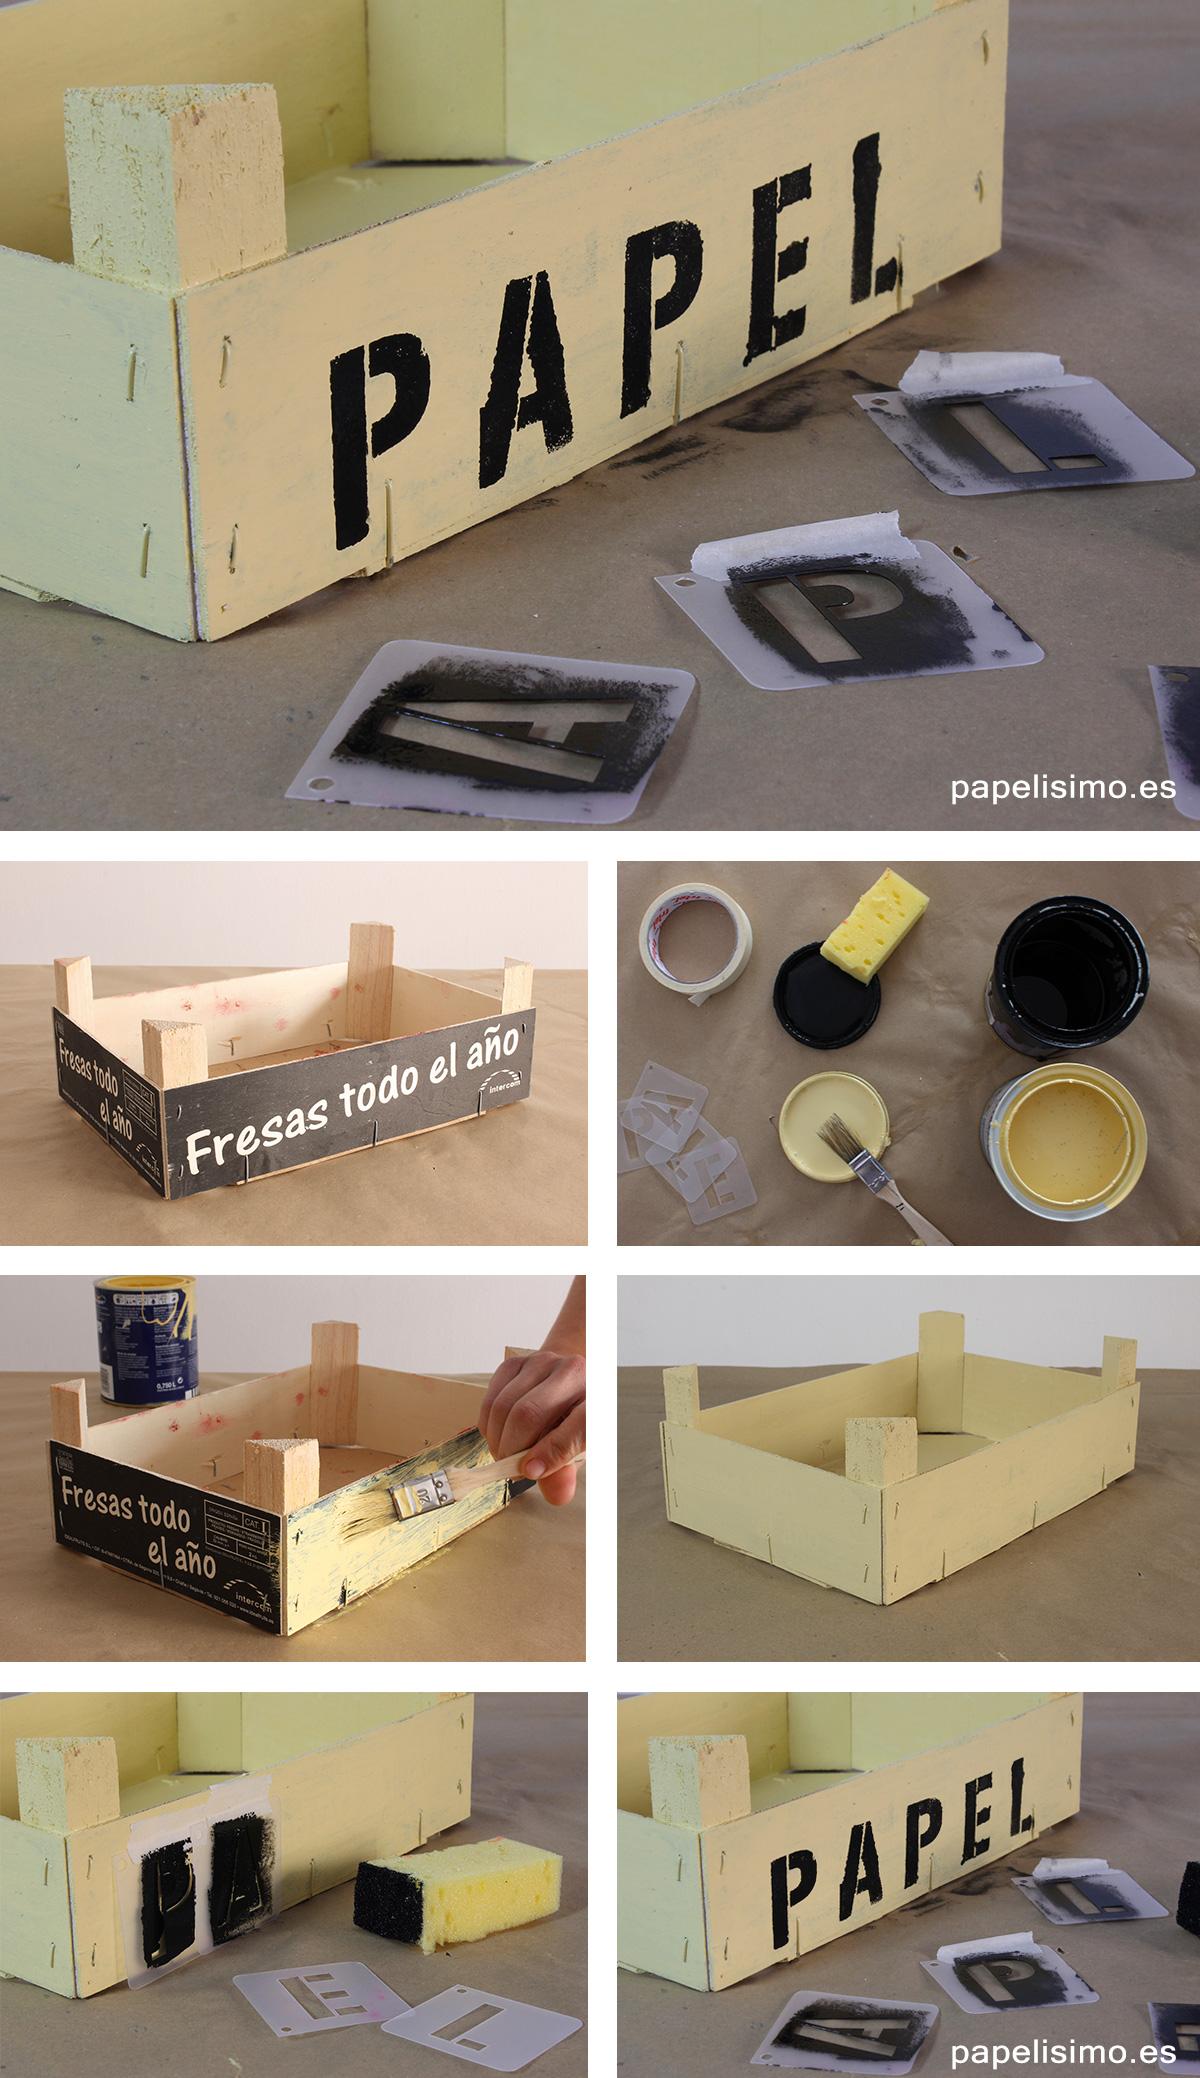 C mo decorar cajas de fruta papelisimo - Caja fruta decoracion ...